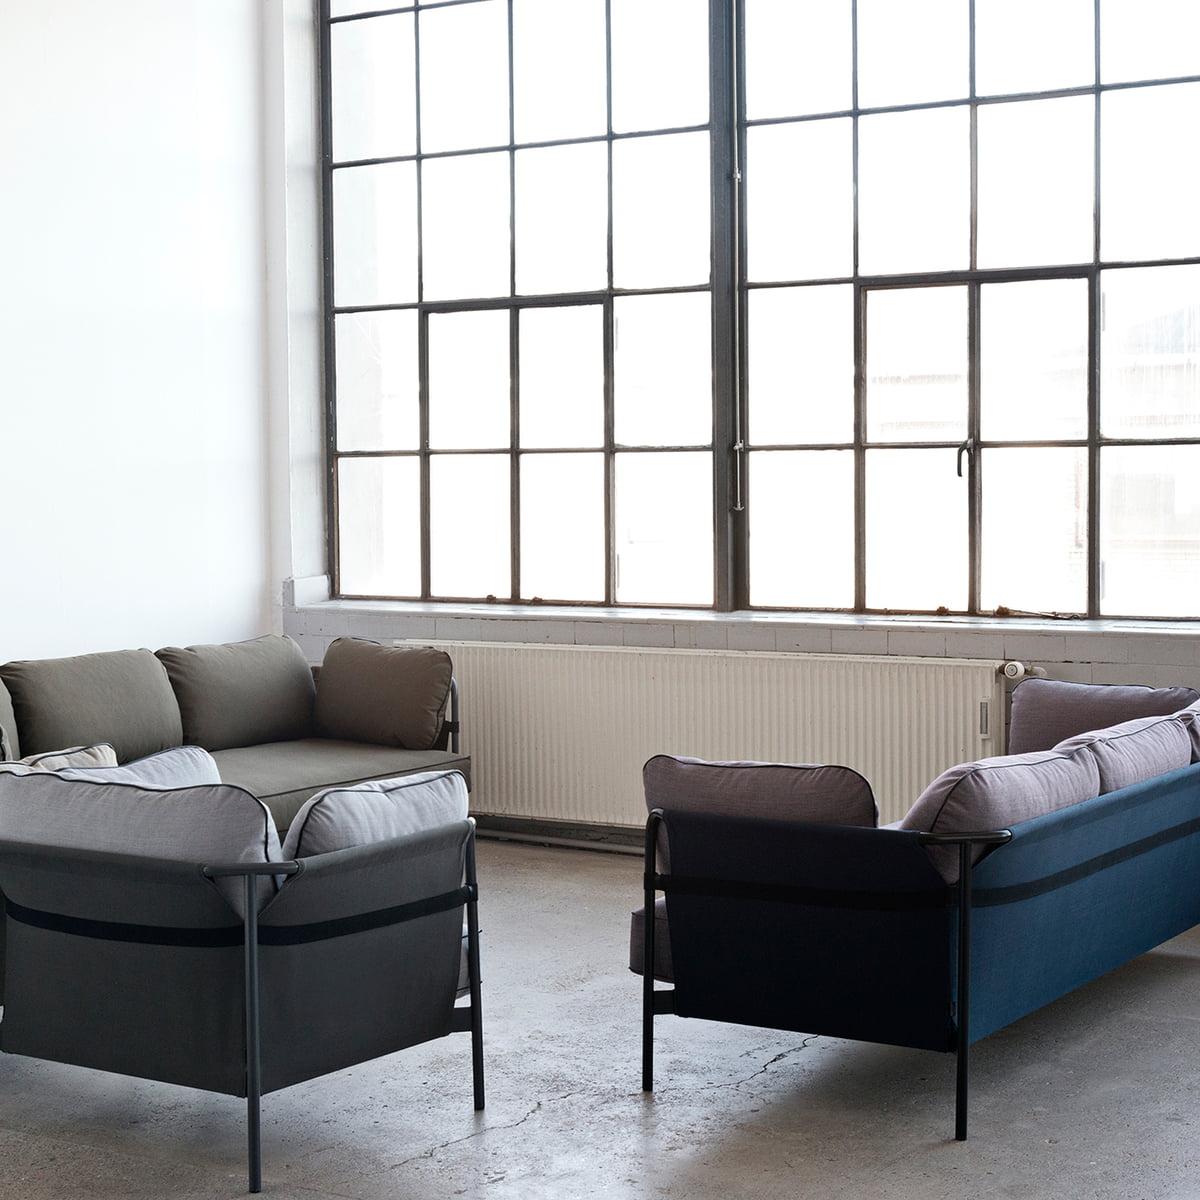 hay can sofa von bouroullec im design shop. Black Bedroom Furniture Sets. Home Design Ideas